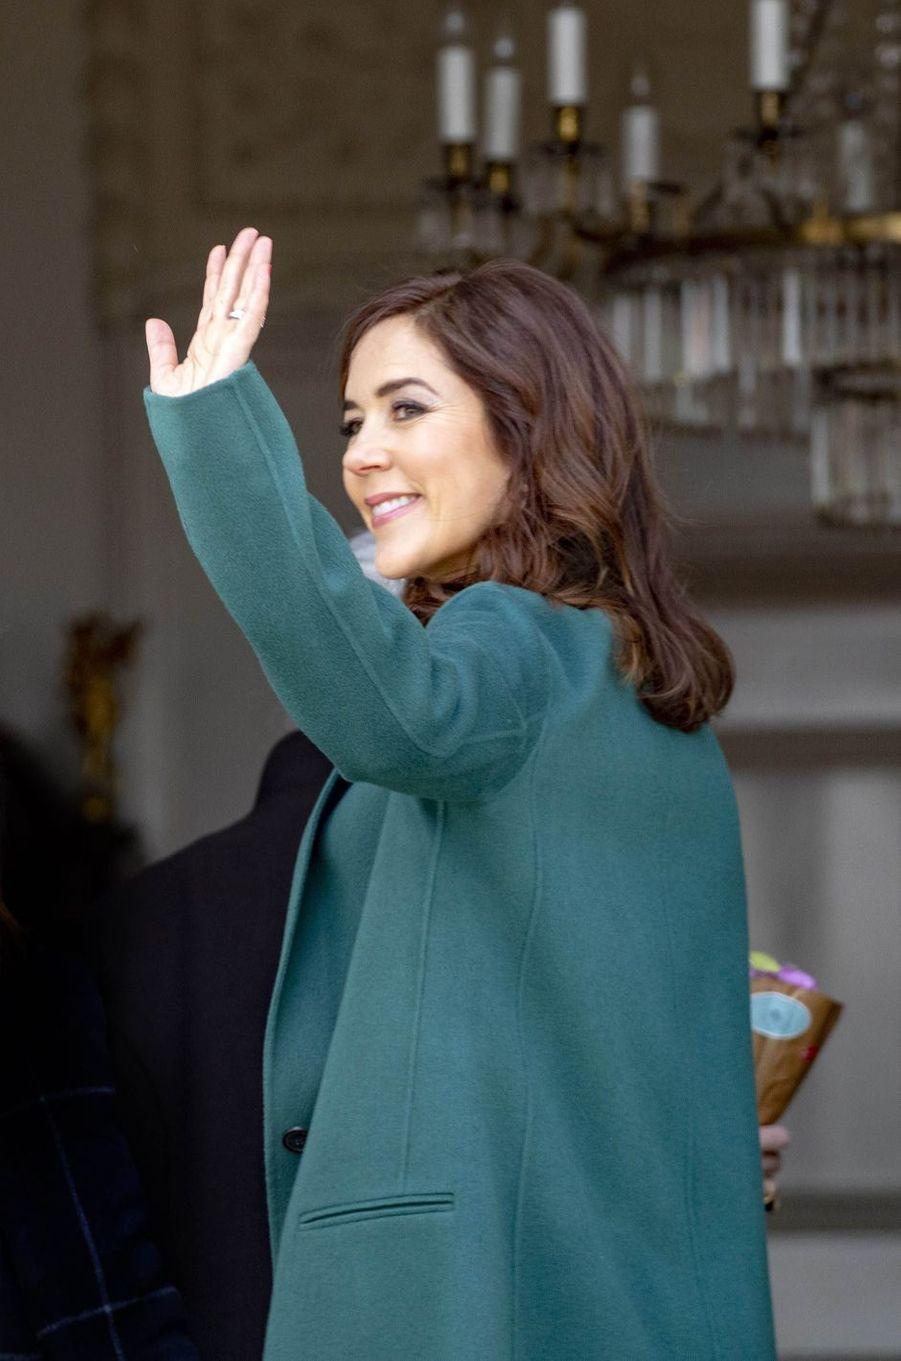 La princesse Mary de Danemark à Aarhus, le 16 avril 2019